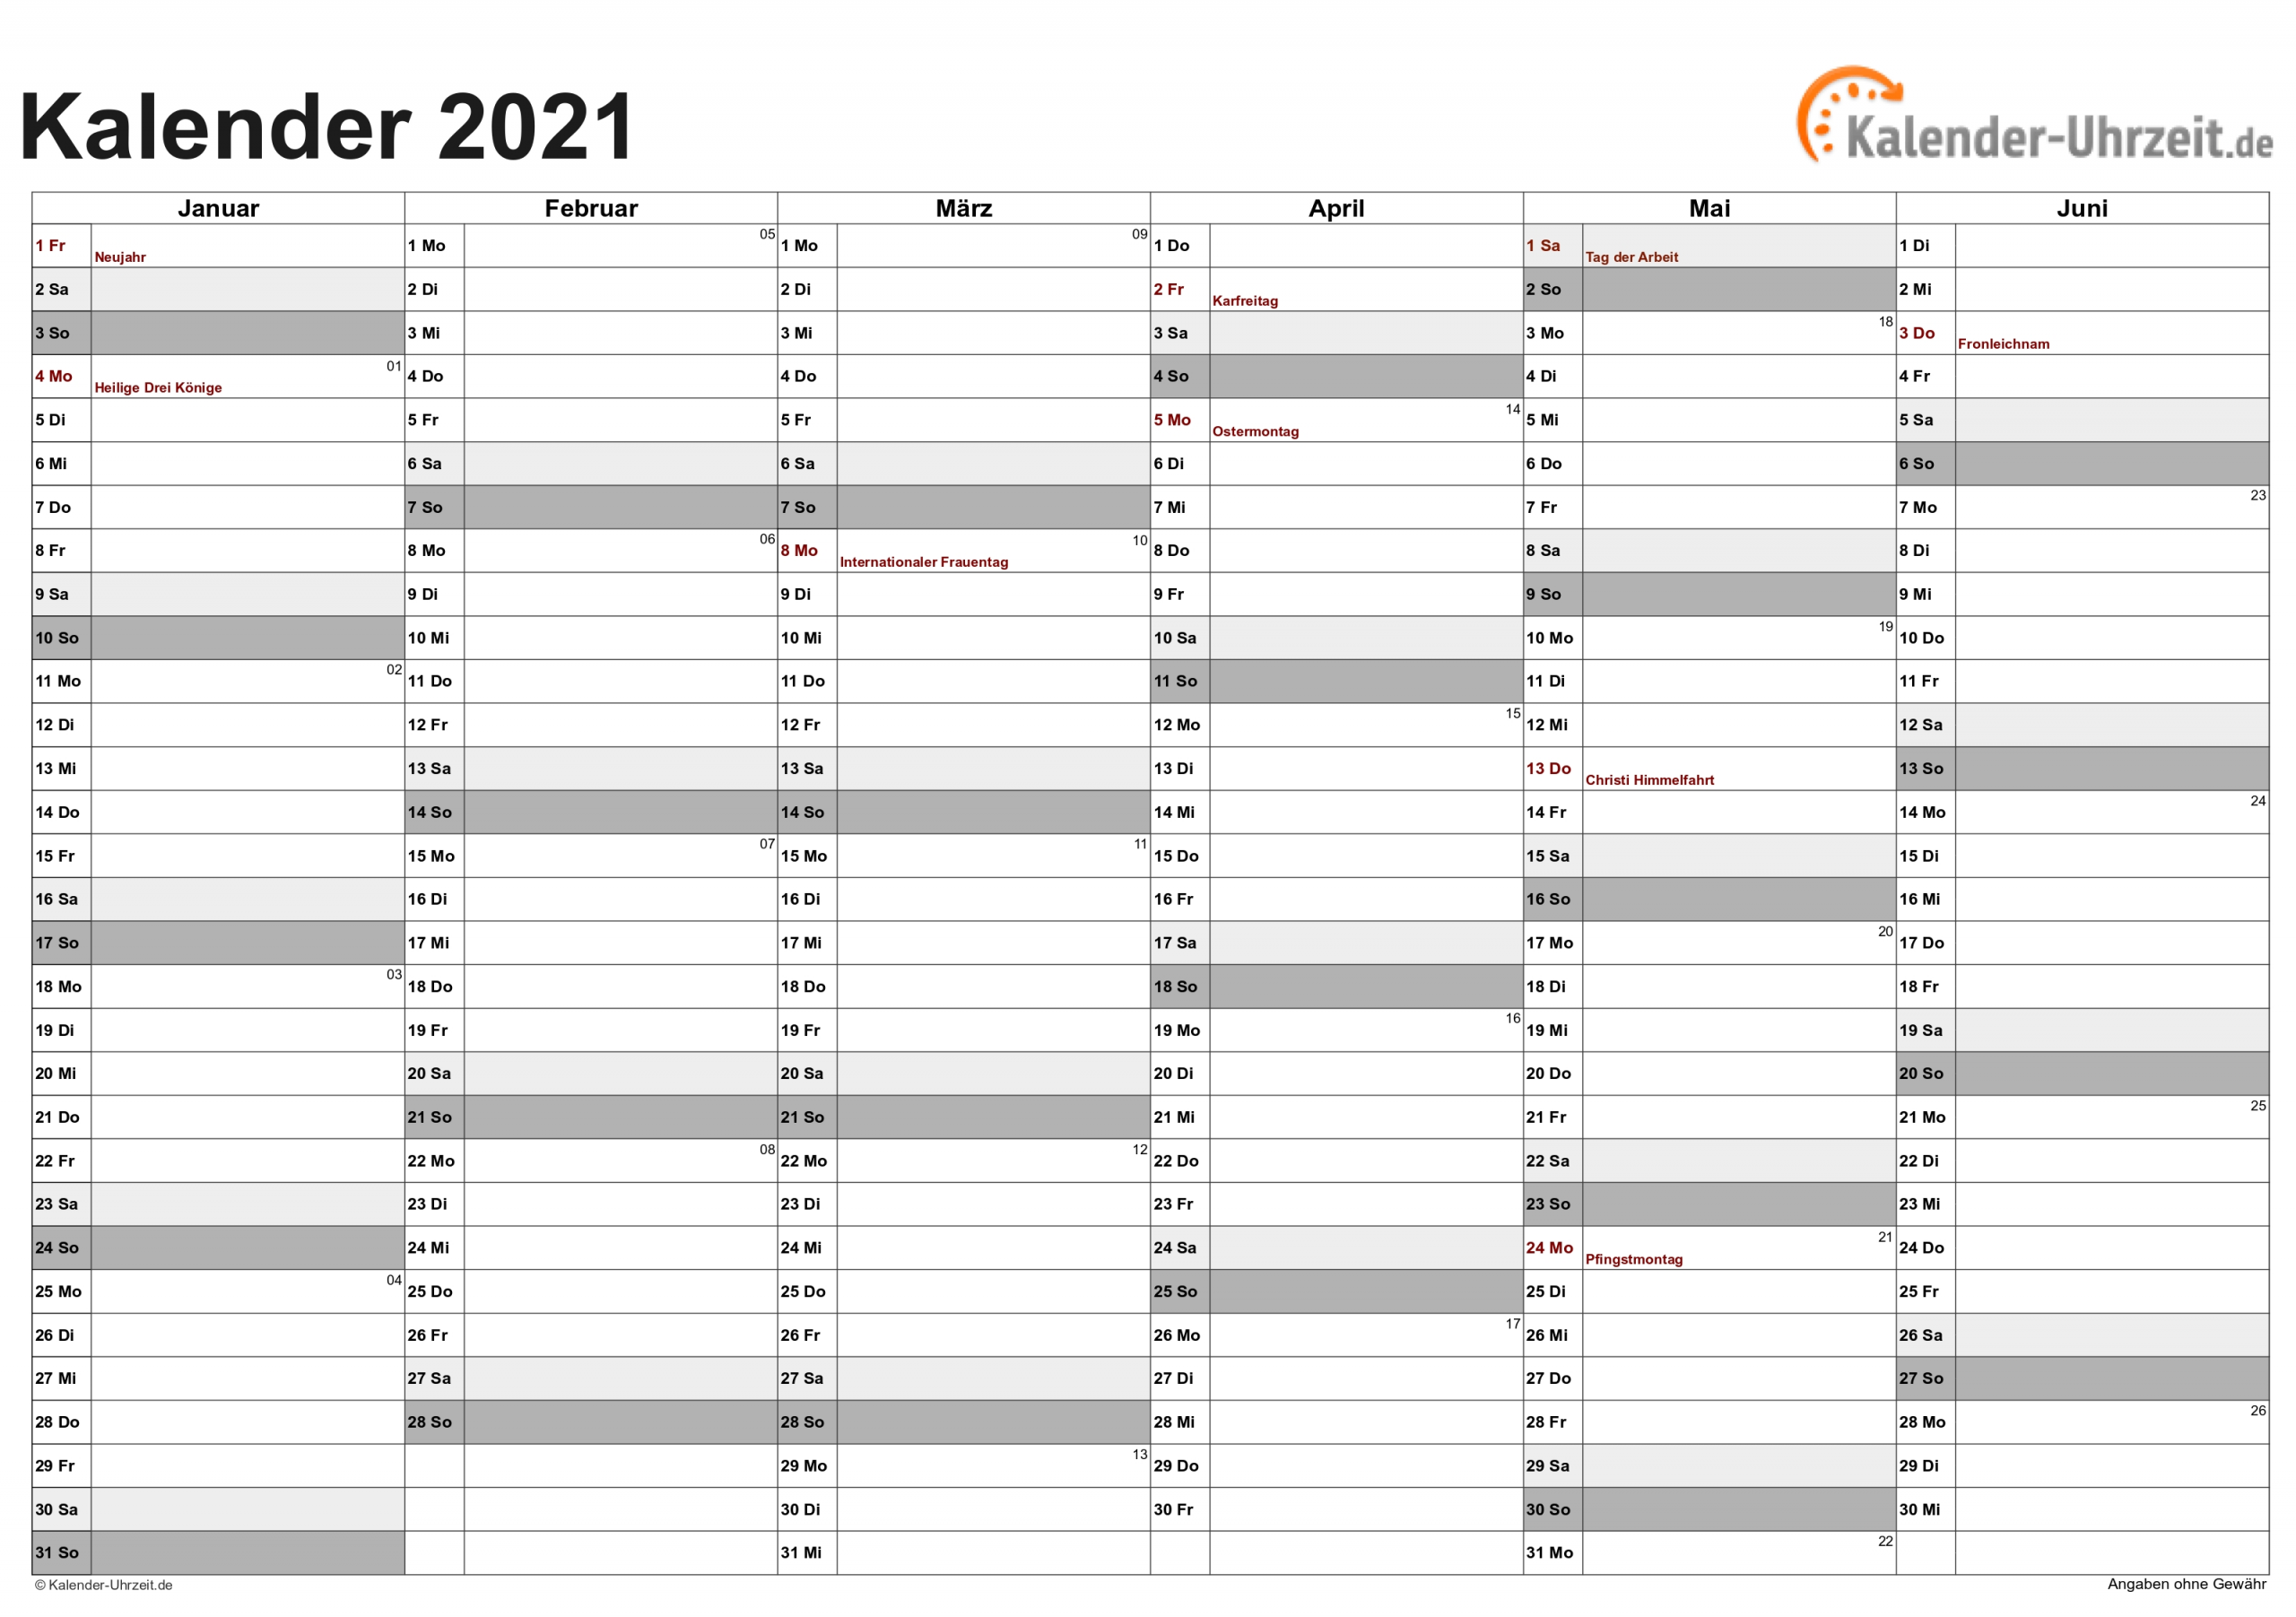 Take Kalenderblatt 2021 Zum Ausdrucken